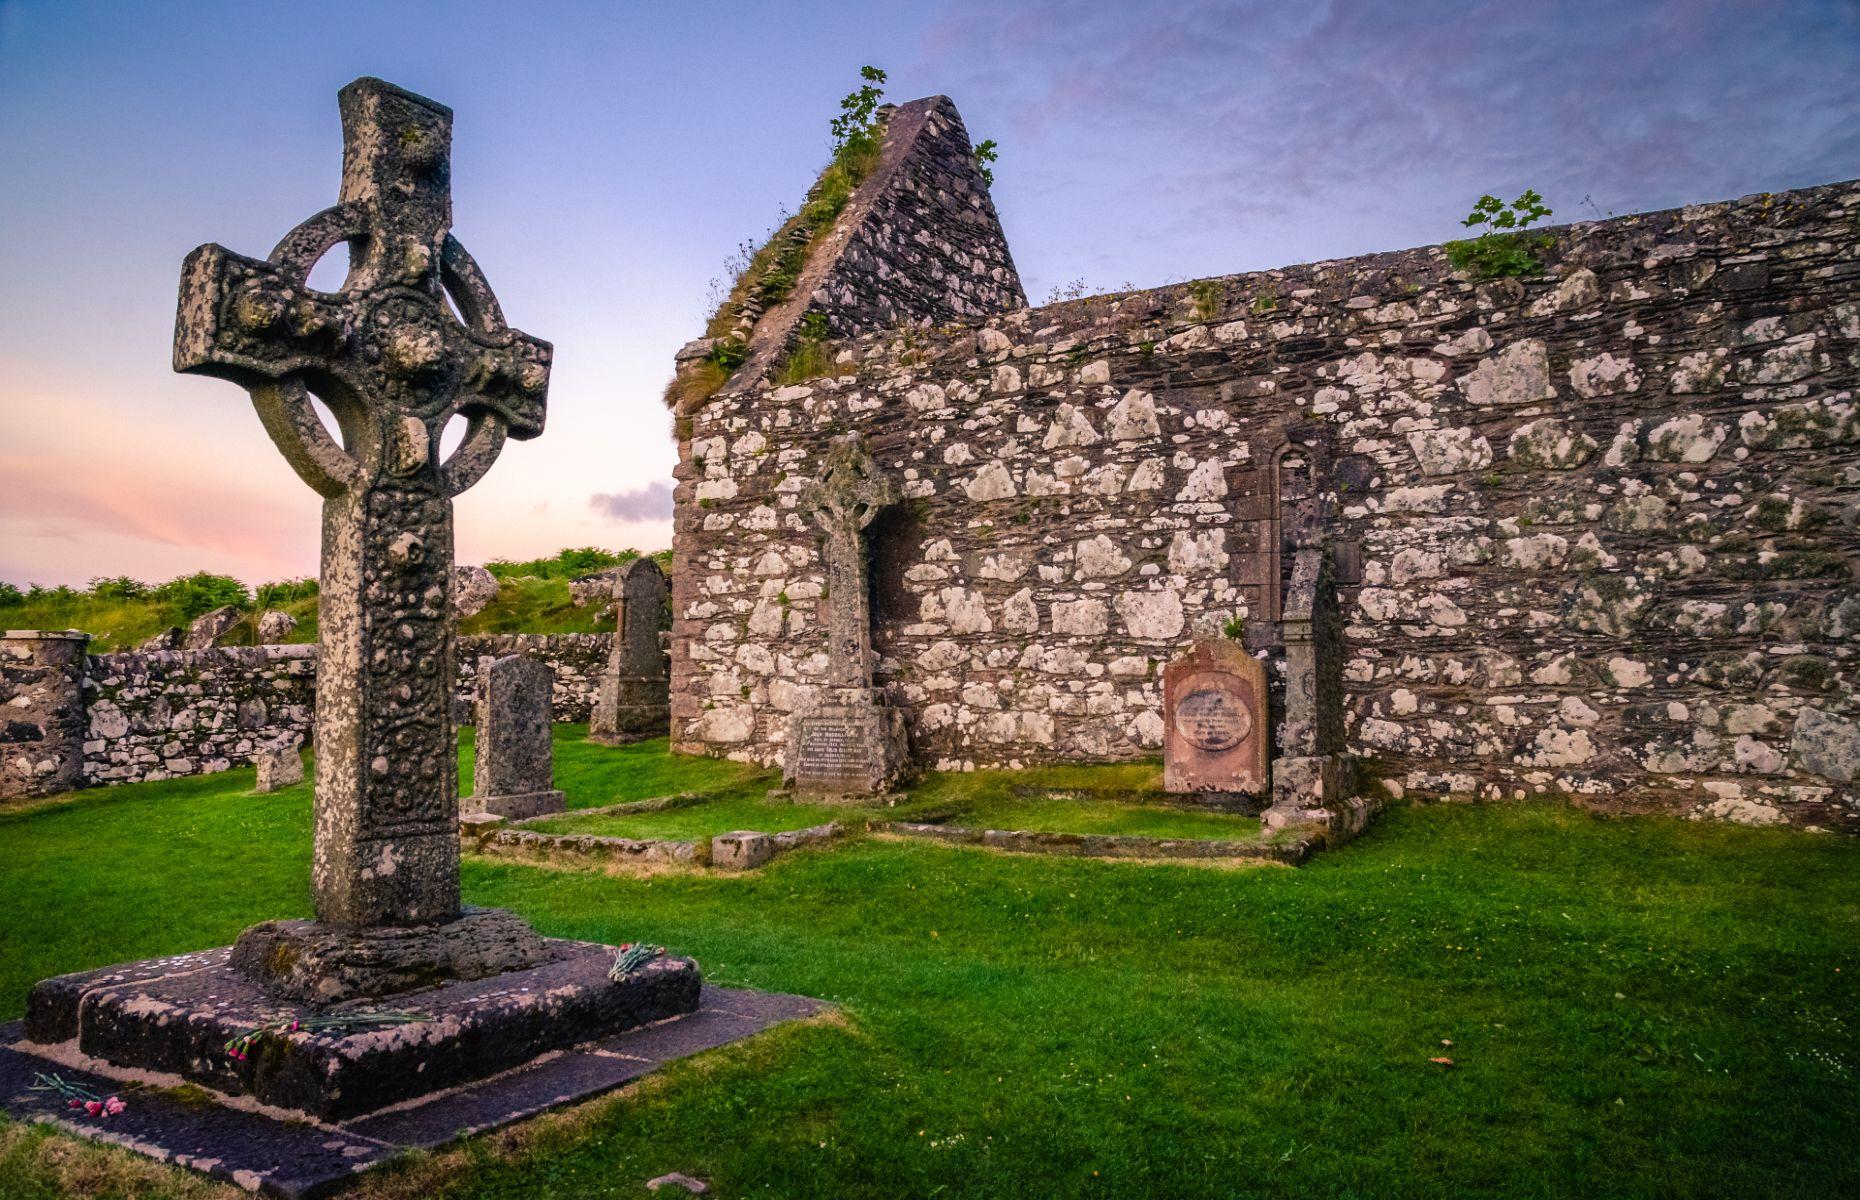 Kildalton Cross (Image: Tomas Zavadil/Shutterstock)